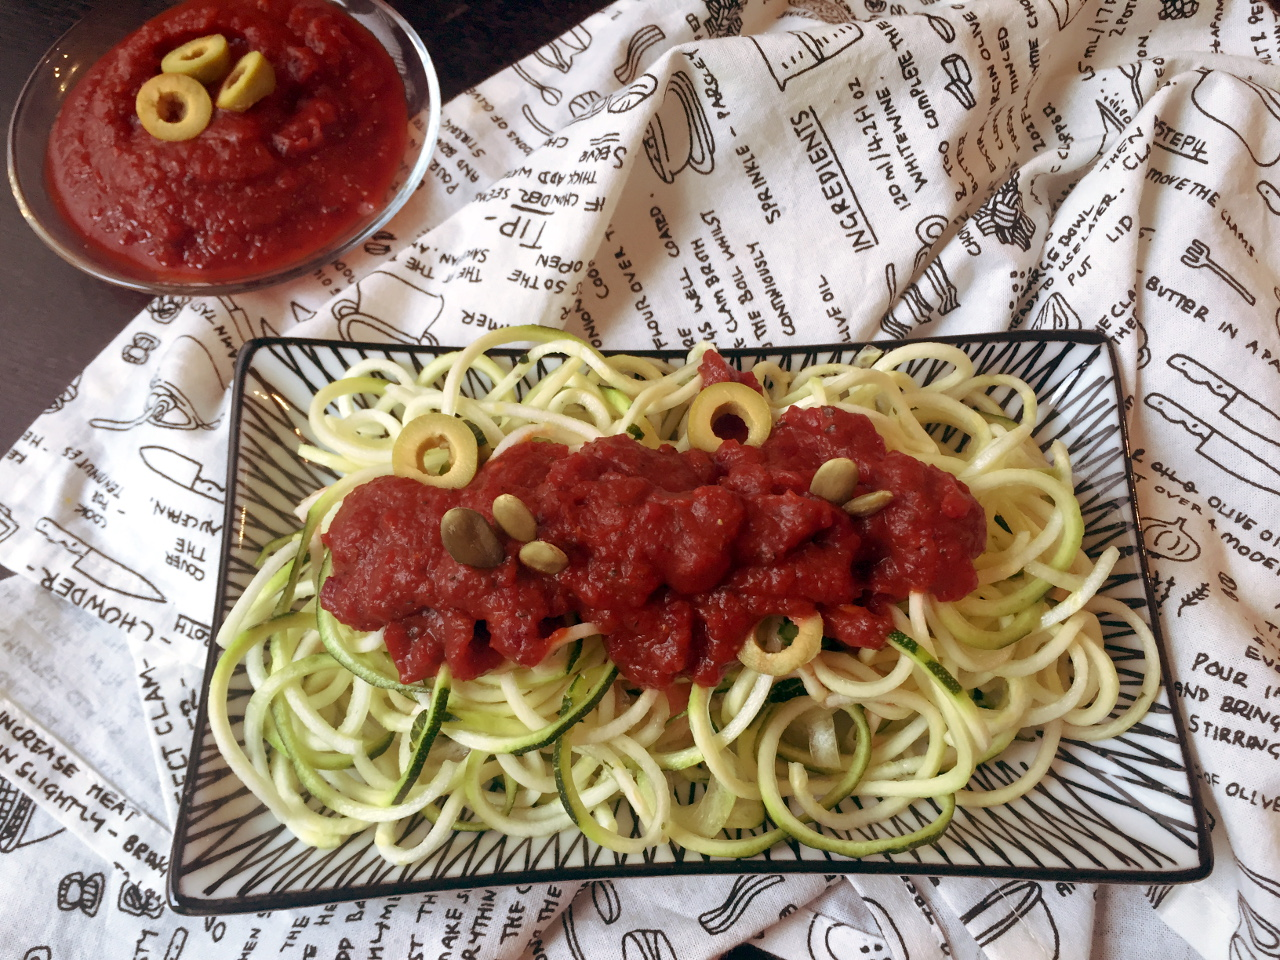 Nomato Sauce Tomato Free Marinara Sauce